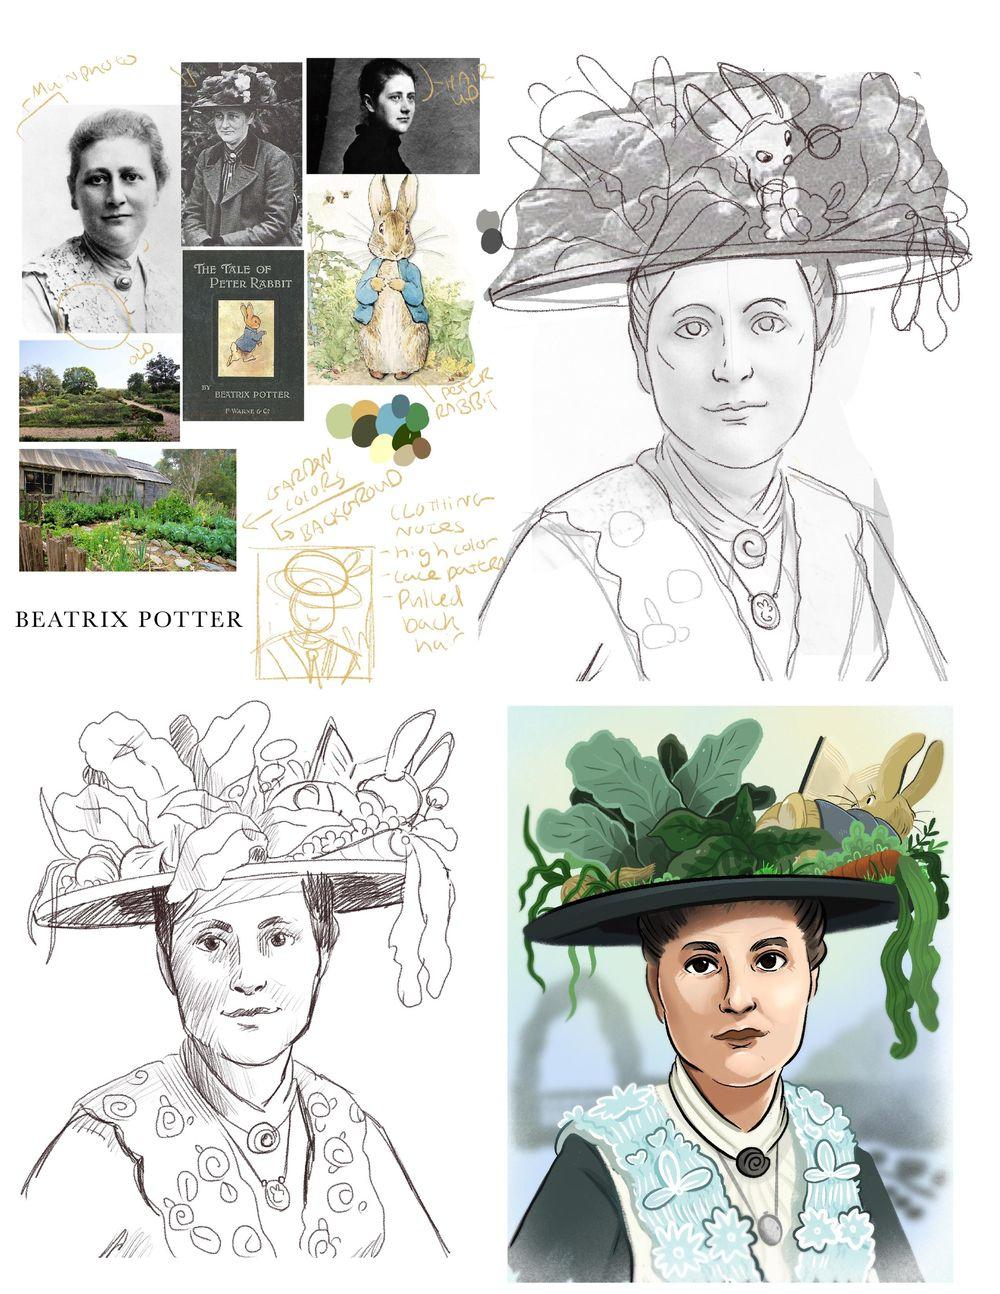 Beatrix Potter - image 2 - student project